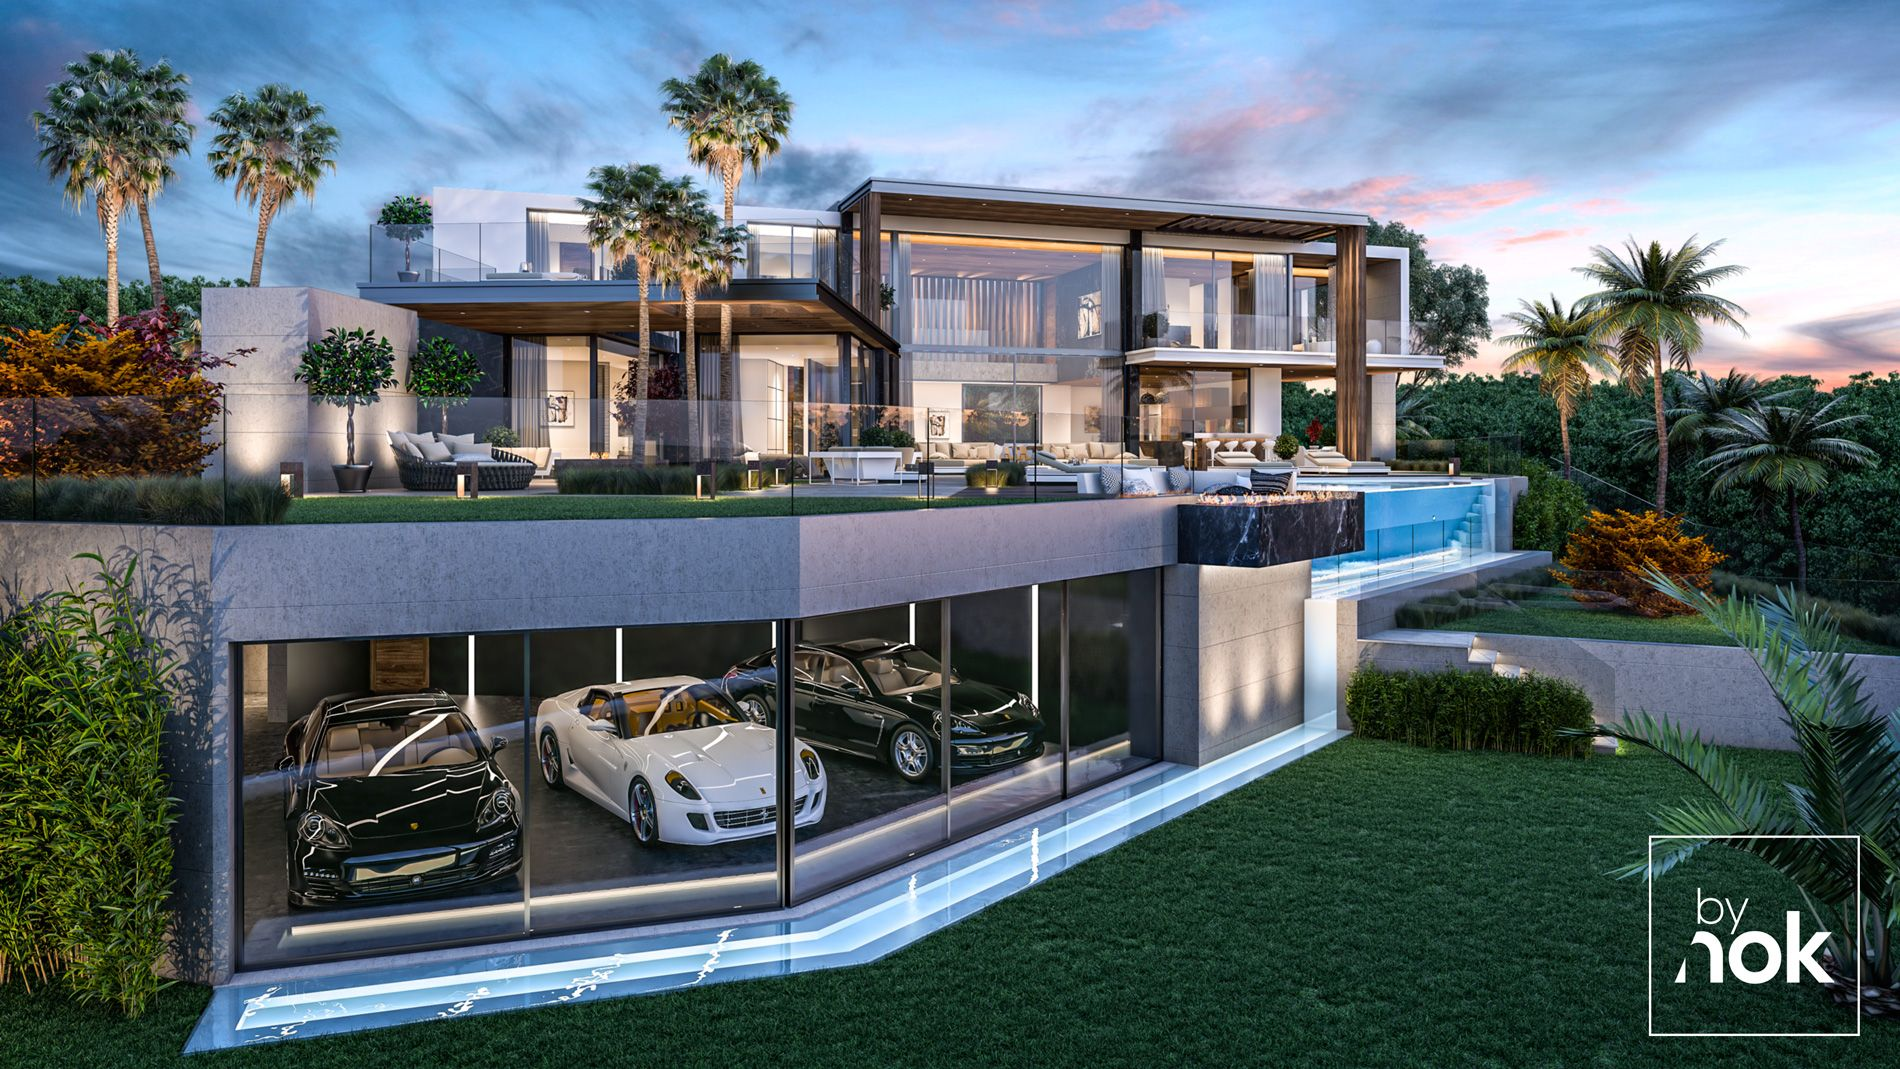 Located in paseo portugal elviria marbella this modern luxury villa designed by